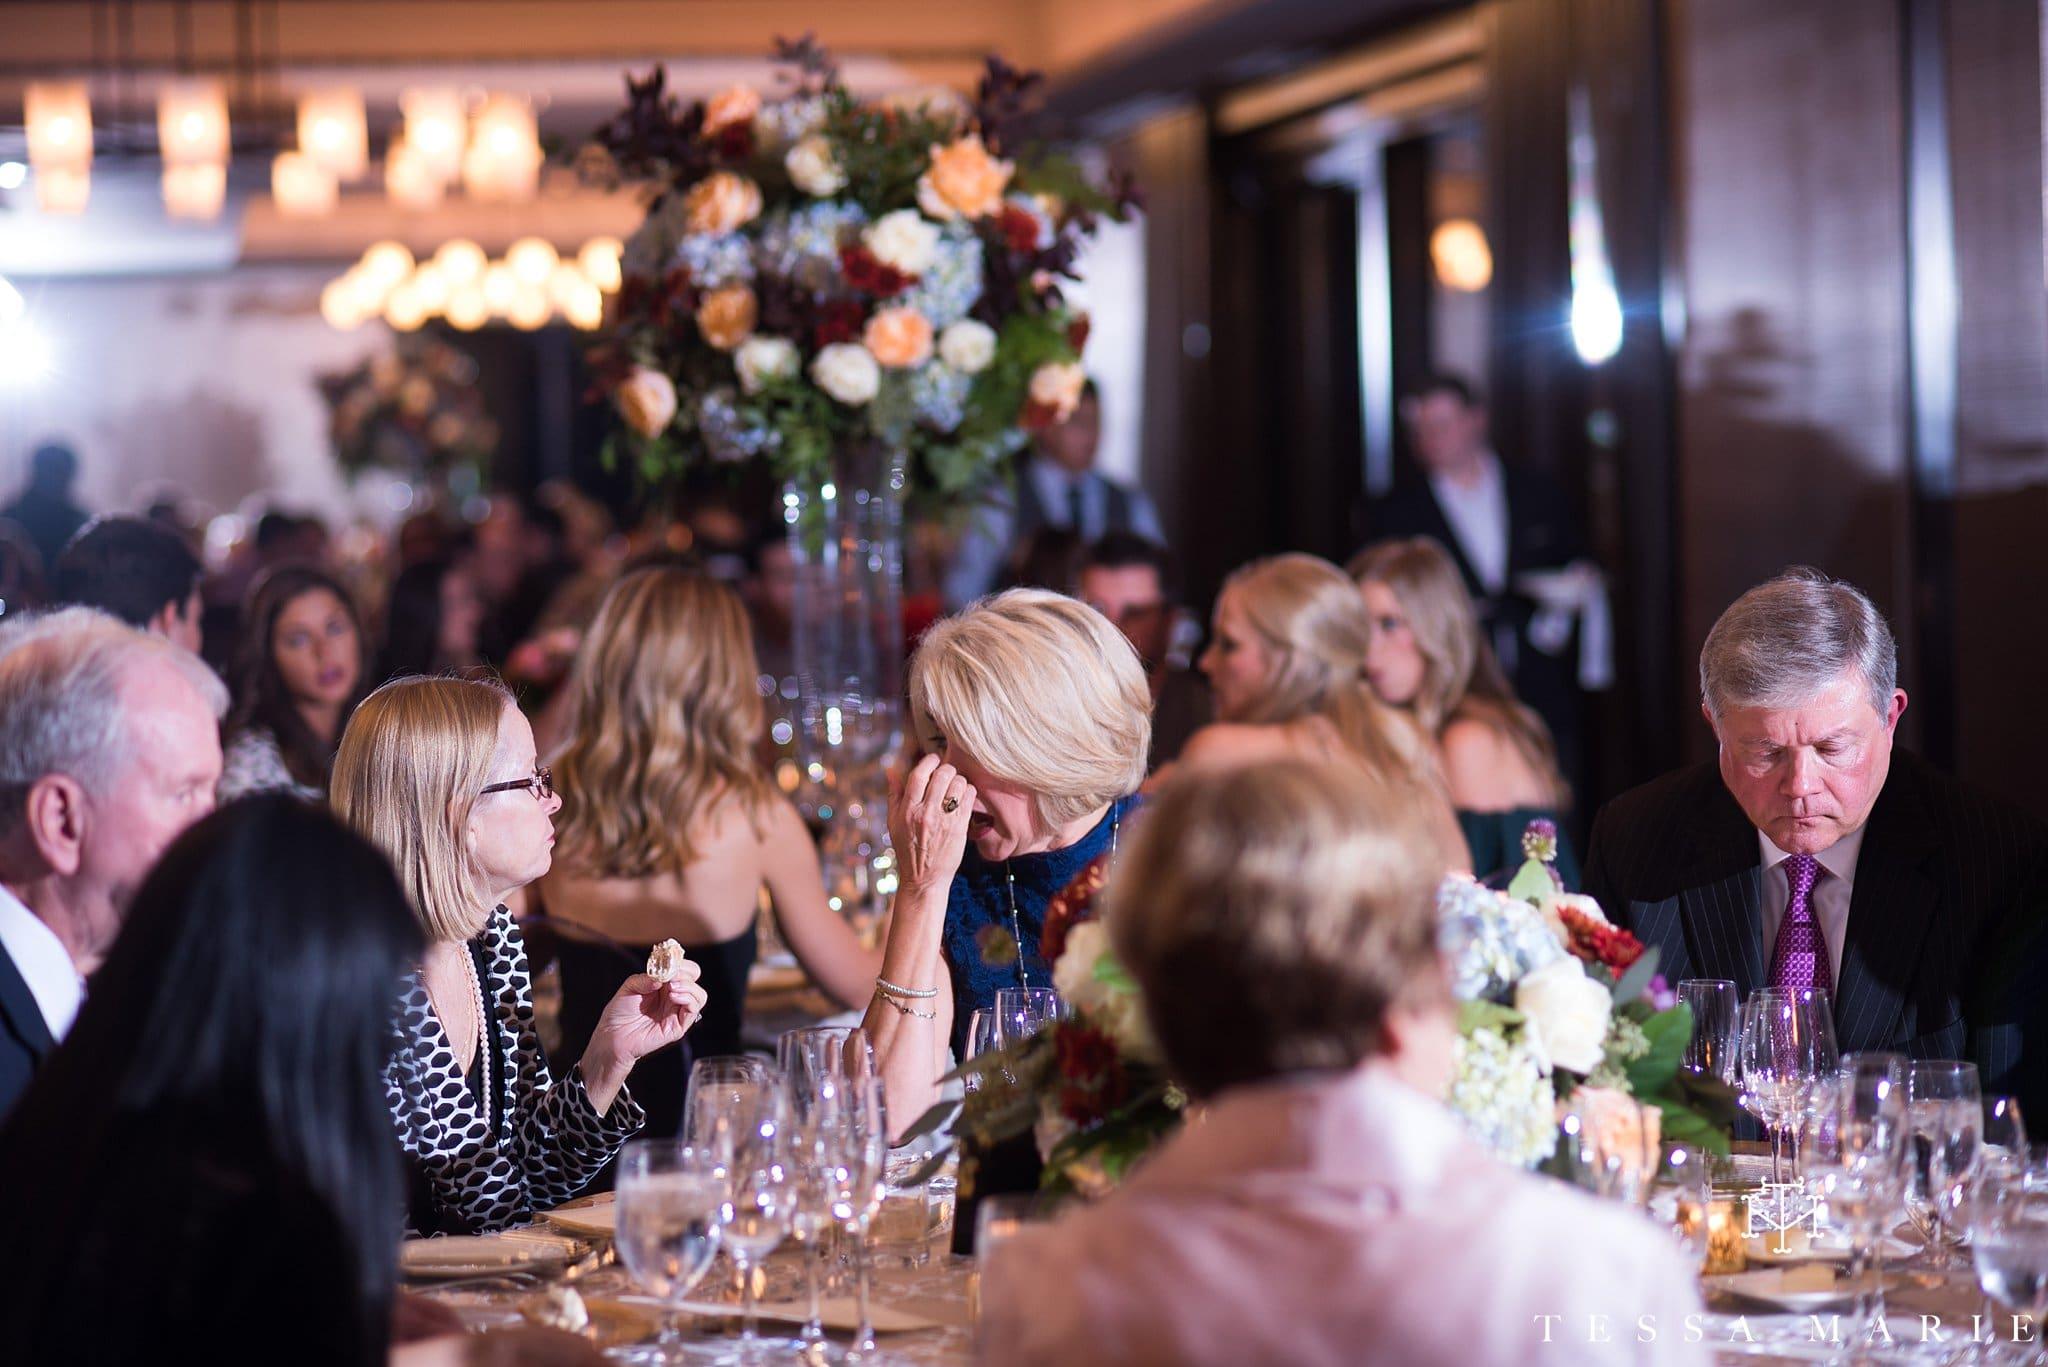 tessa_marie_Weddings_four_seasons_rehersal_dinner_pictures_wedding_atlanta_wedding_getting_married_0034.jpg